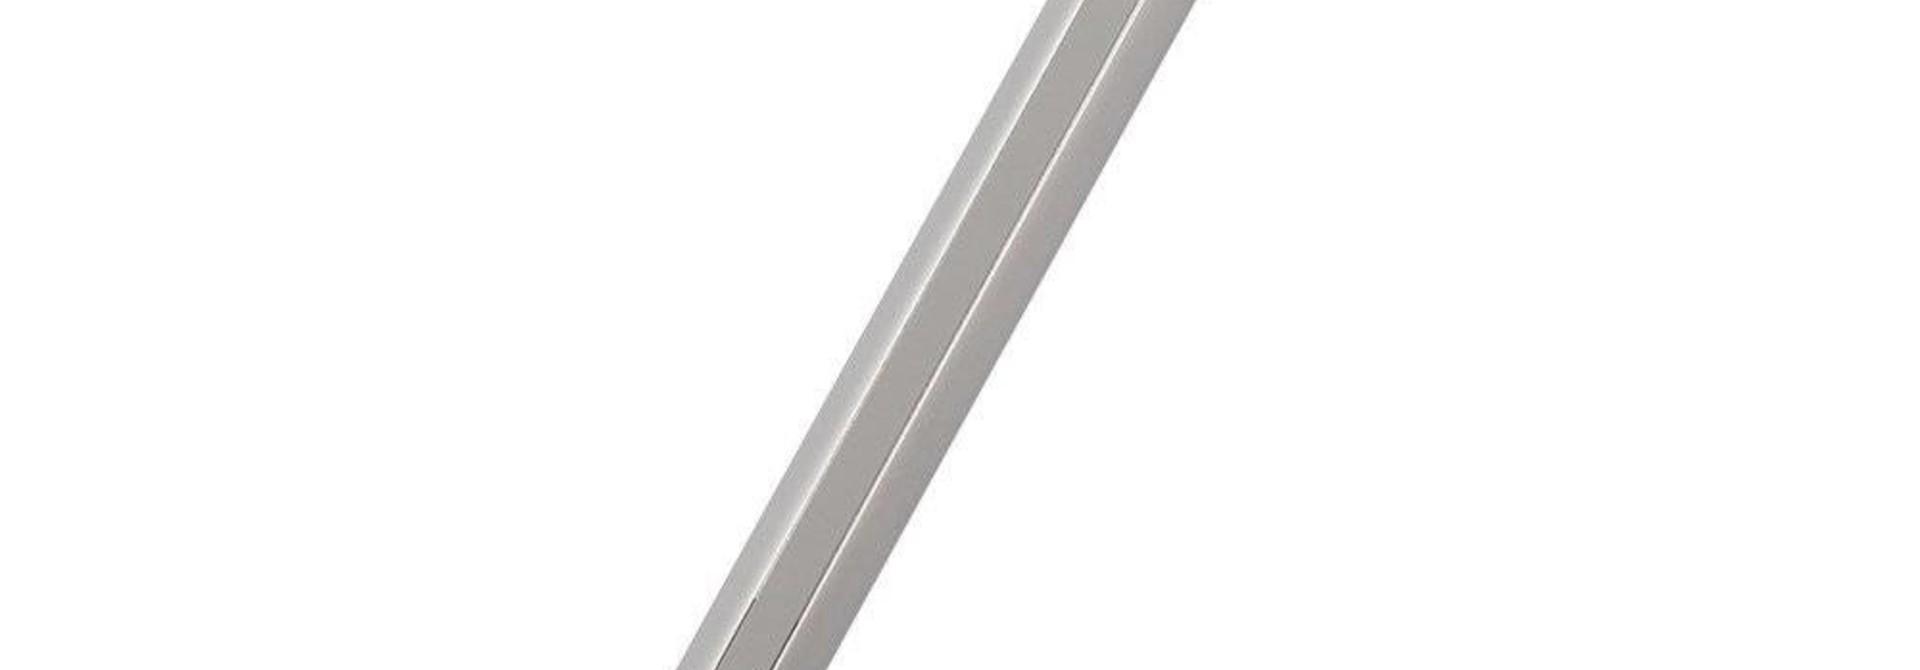 Pencil Slot Erweiterung Individuell